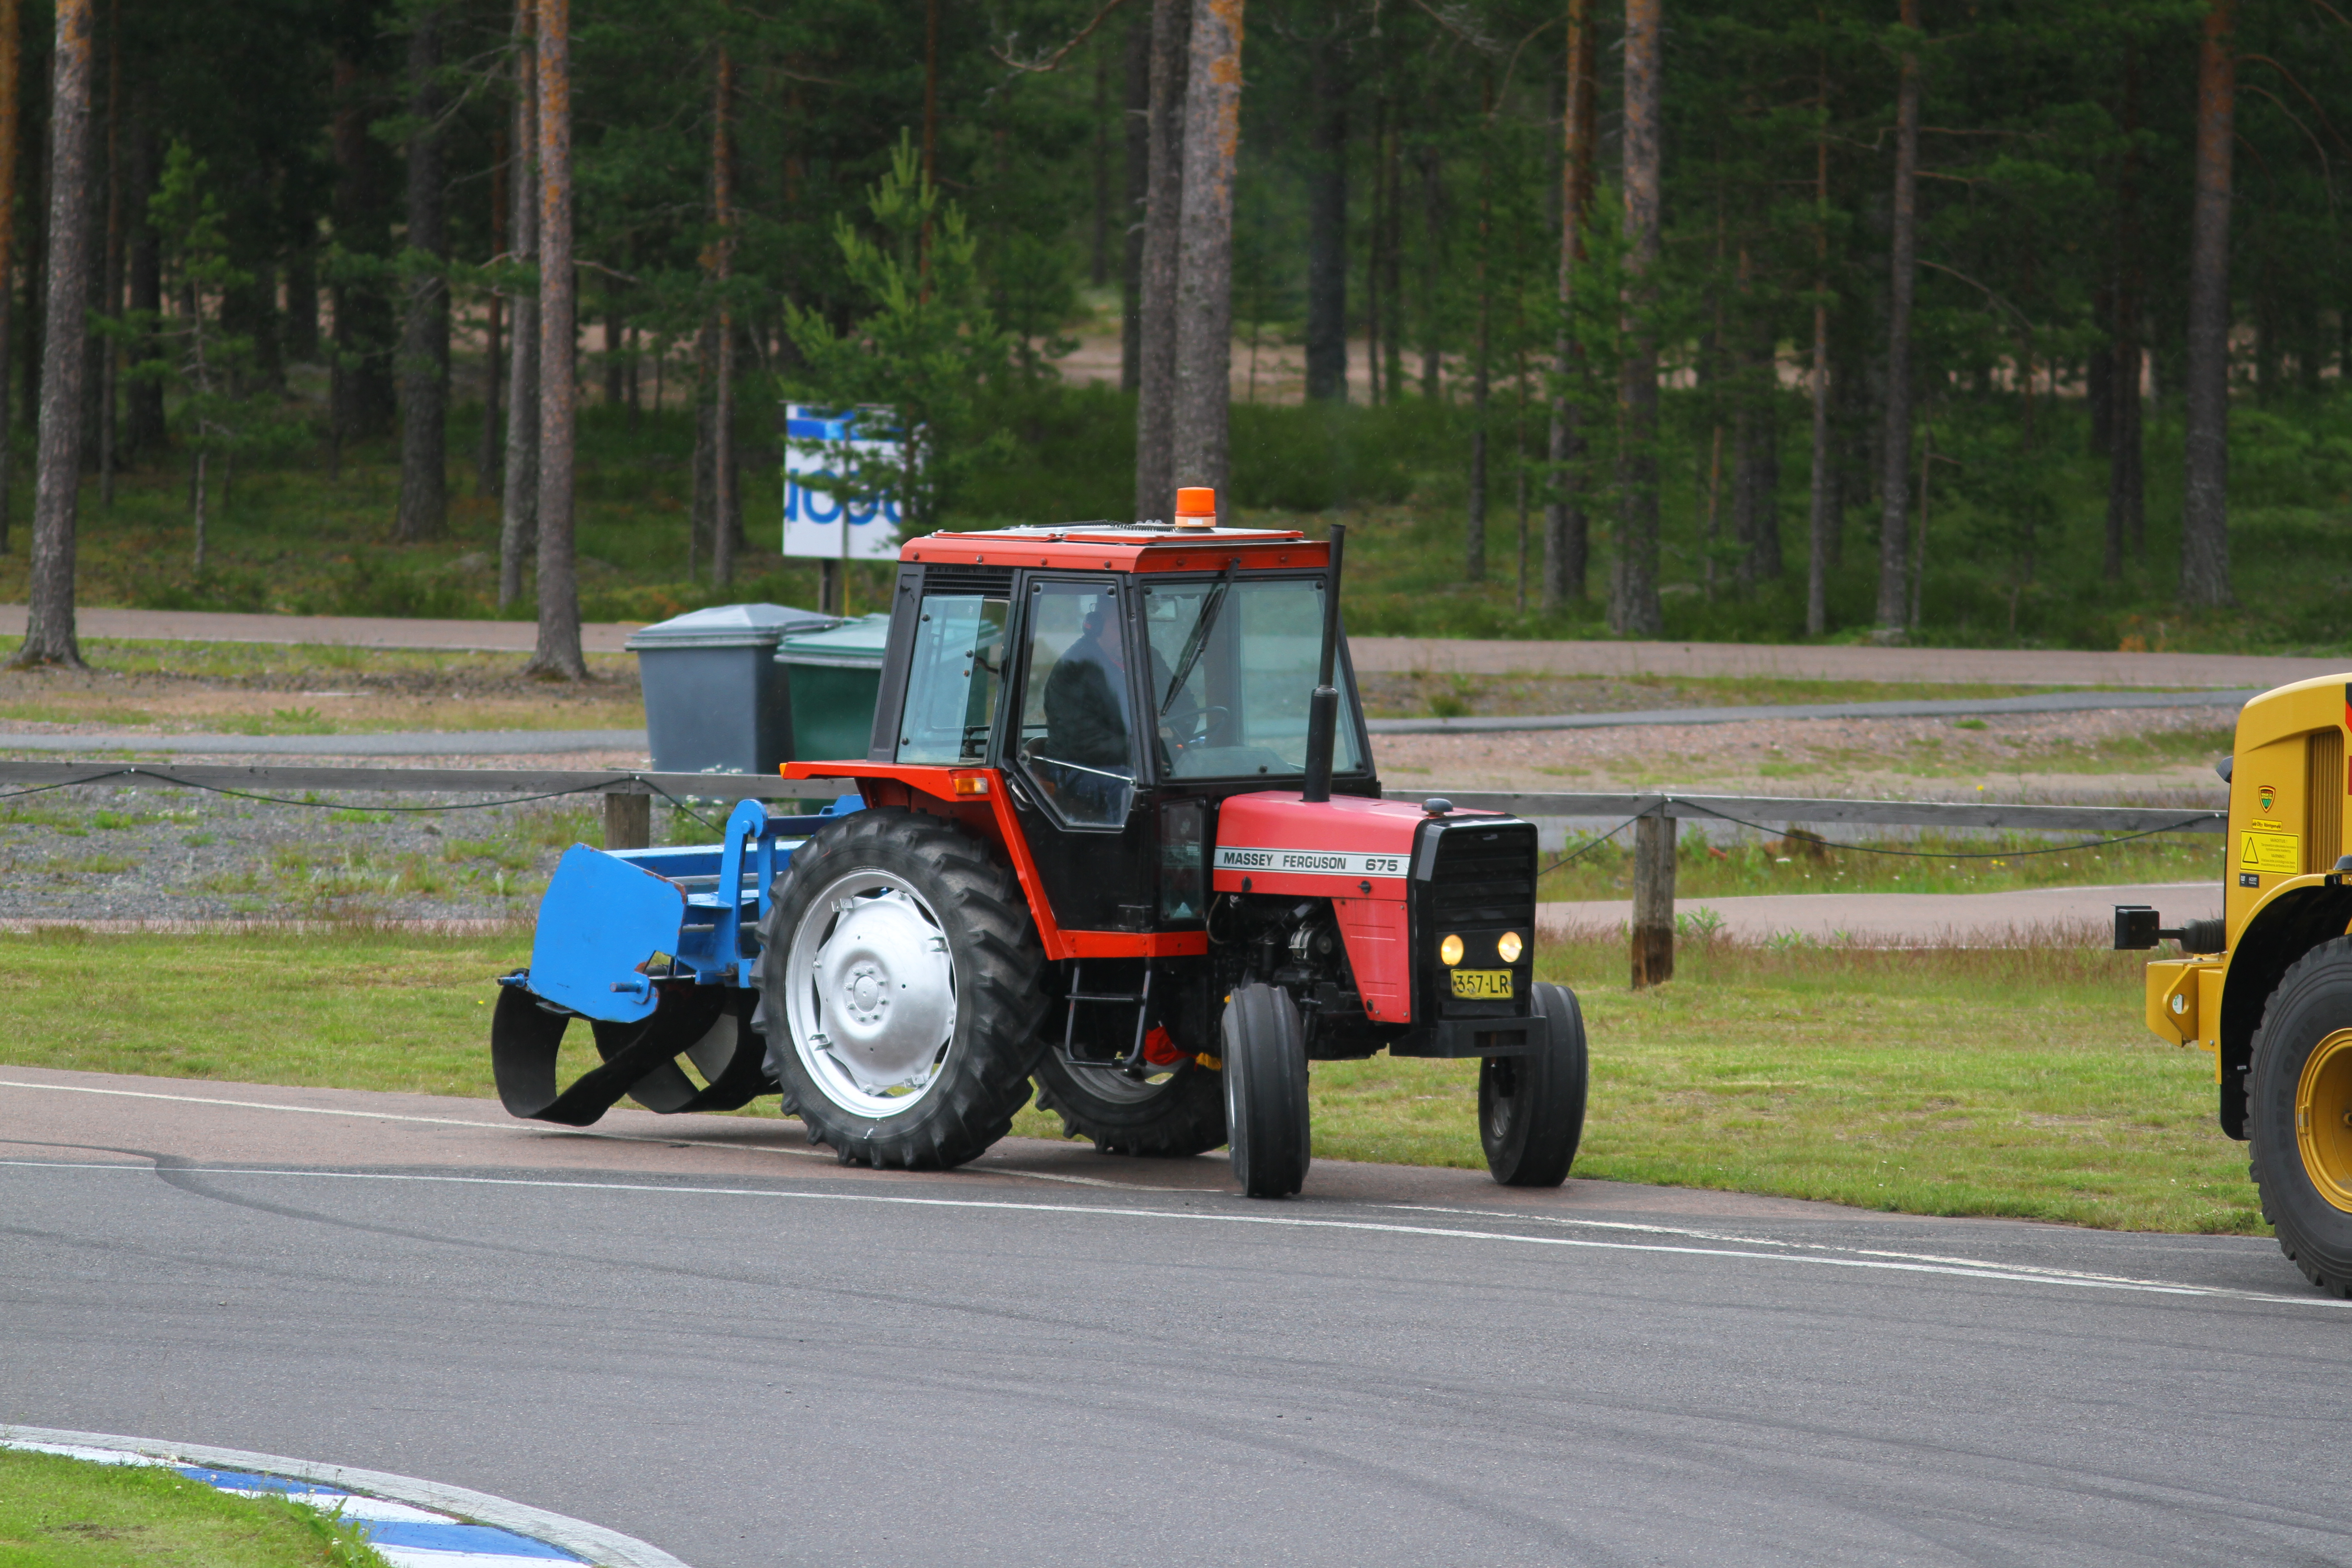 File:Massey Ferguson 675, Kamasa Drag Race Week, Alastaro, 30.6.2012